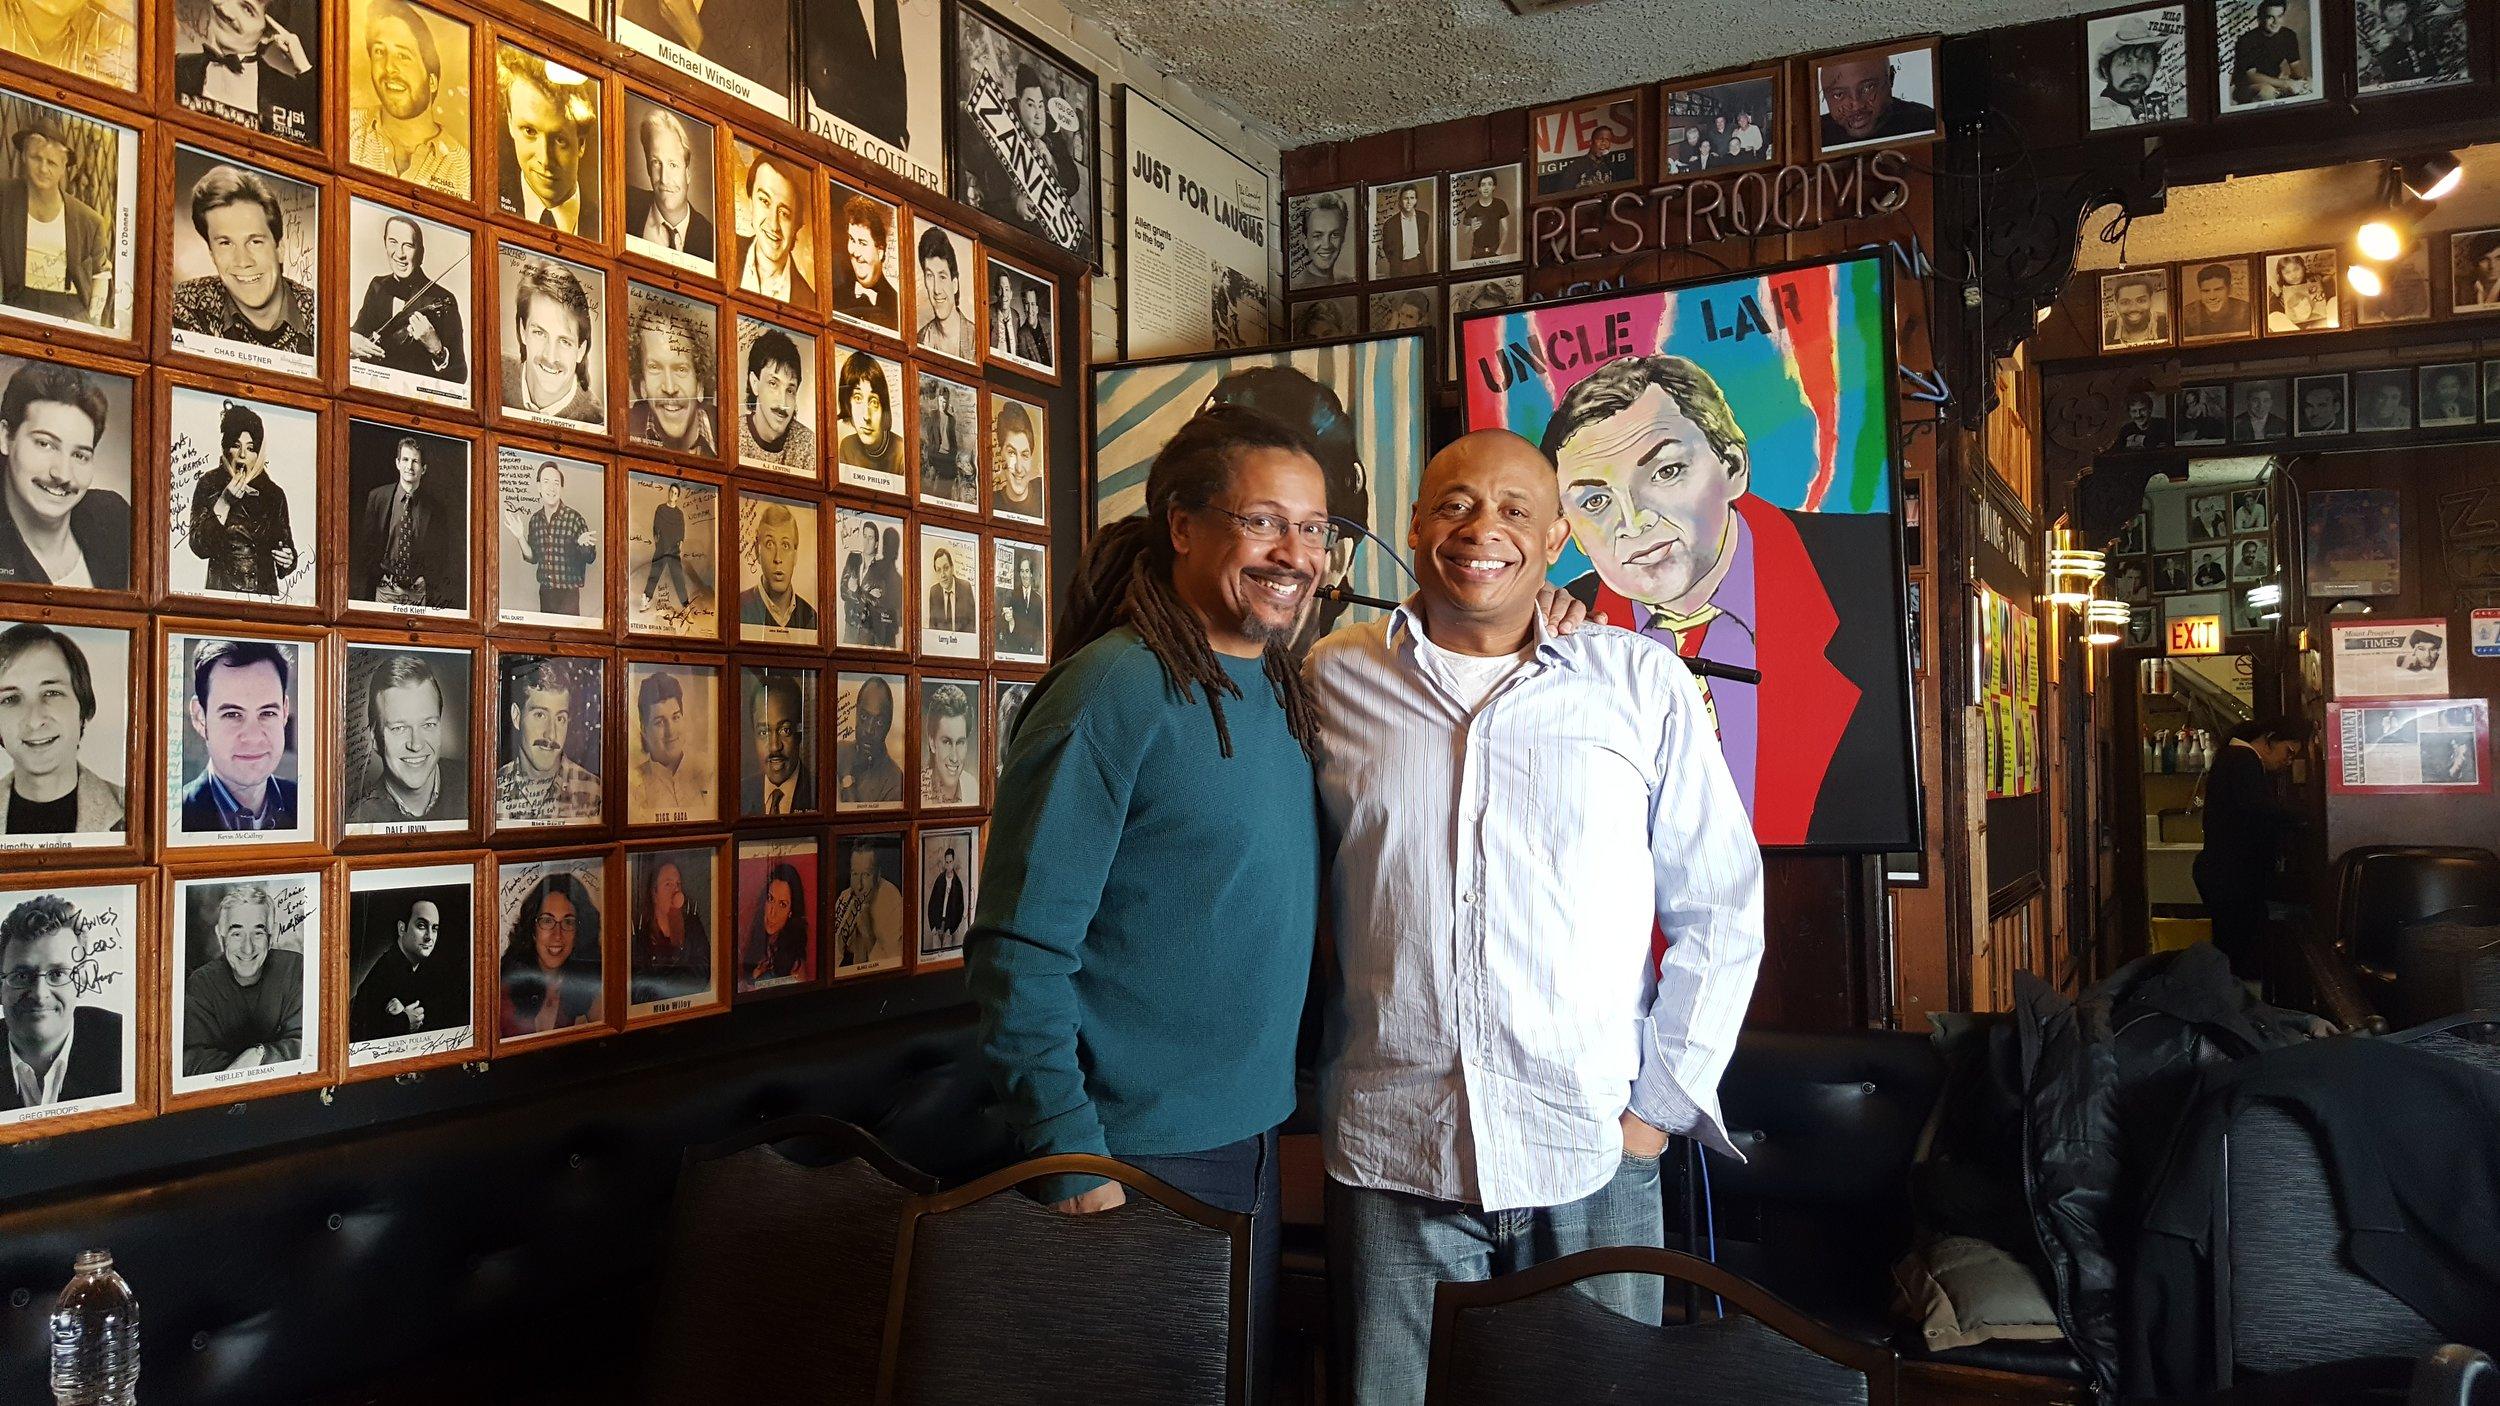 Michael Alexander and Dwayne Kennedy